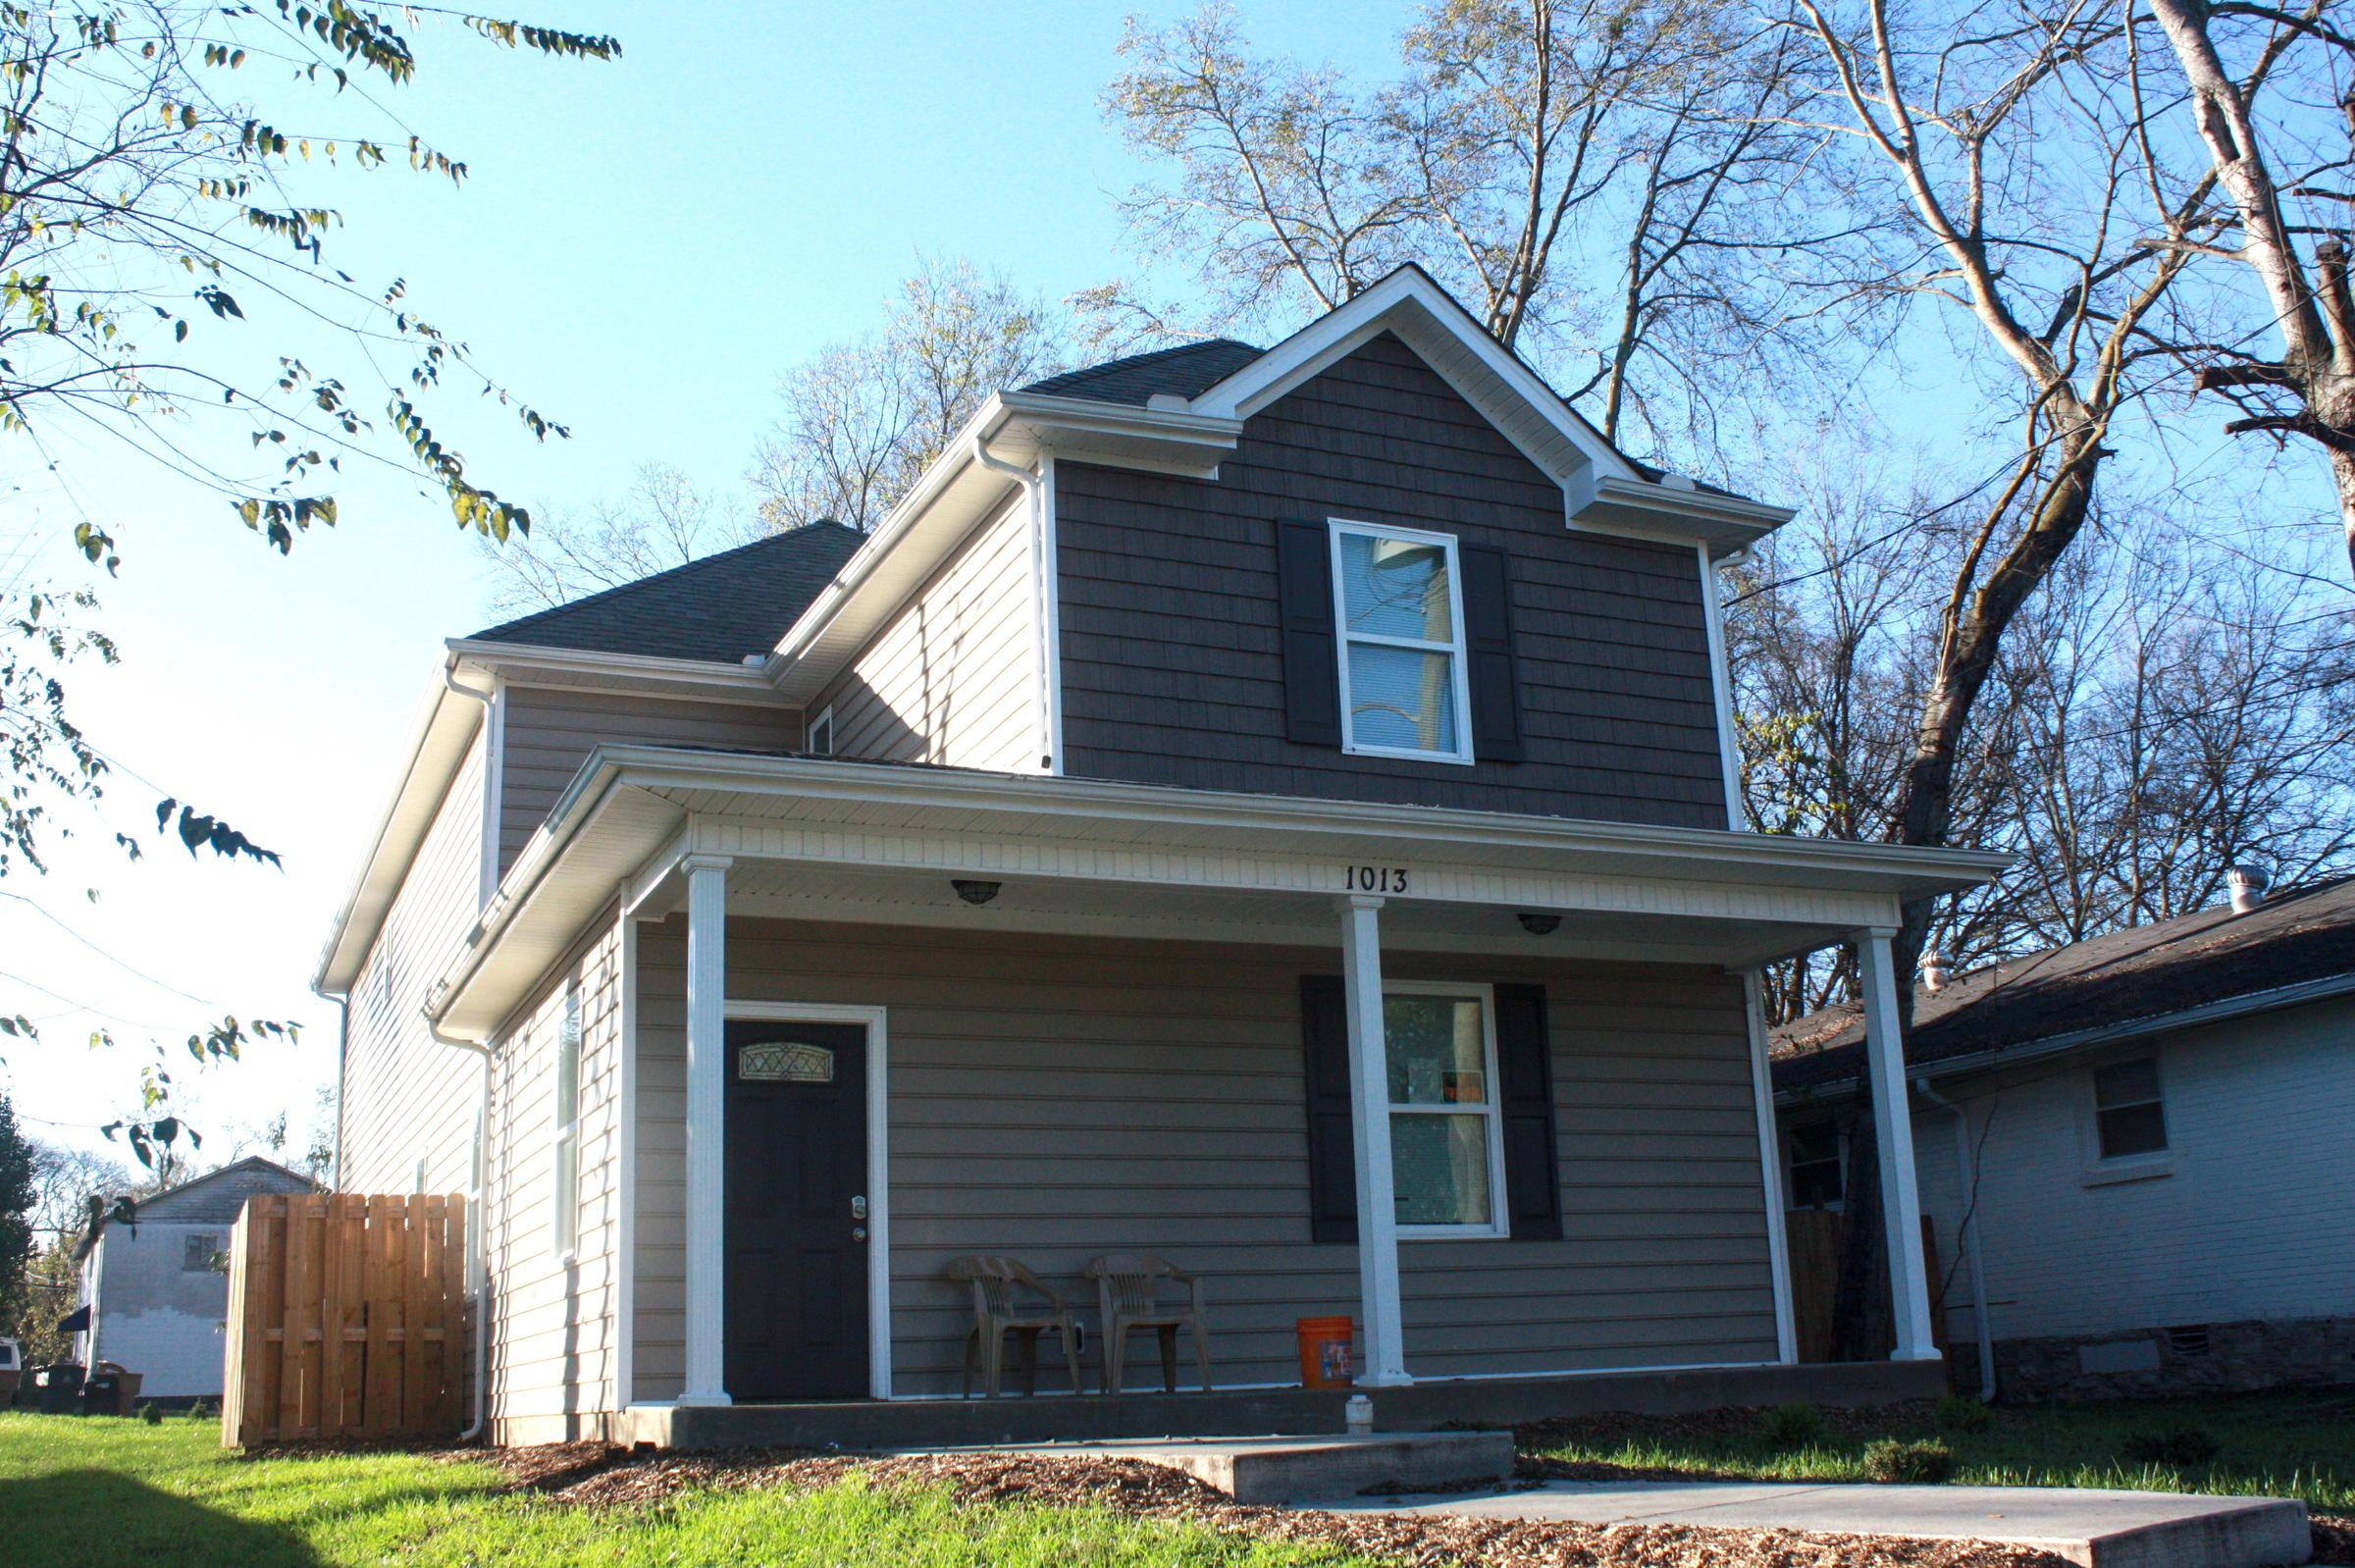 cool building an affordable home. barnes fund 7512 jpg Nashville Awards  2 Million To Build 57 Affordable Homes But